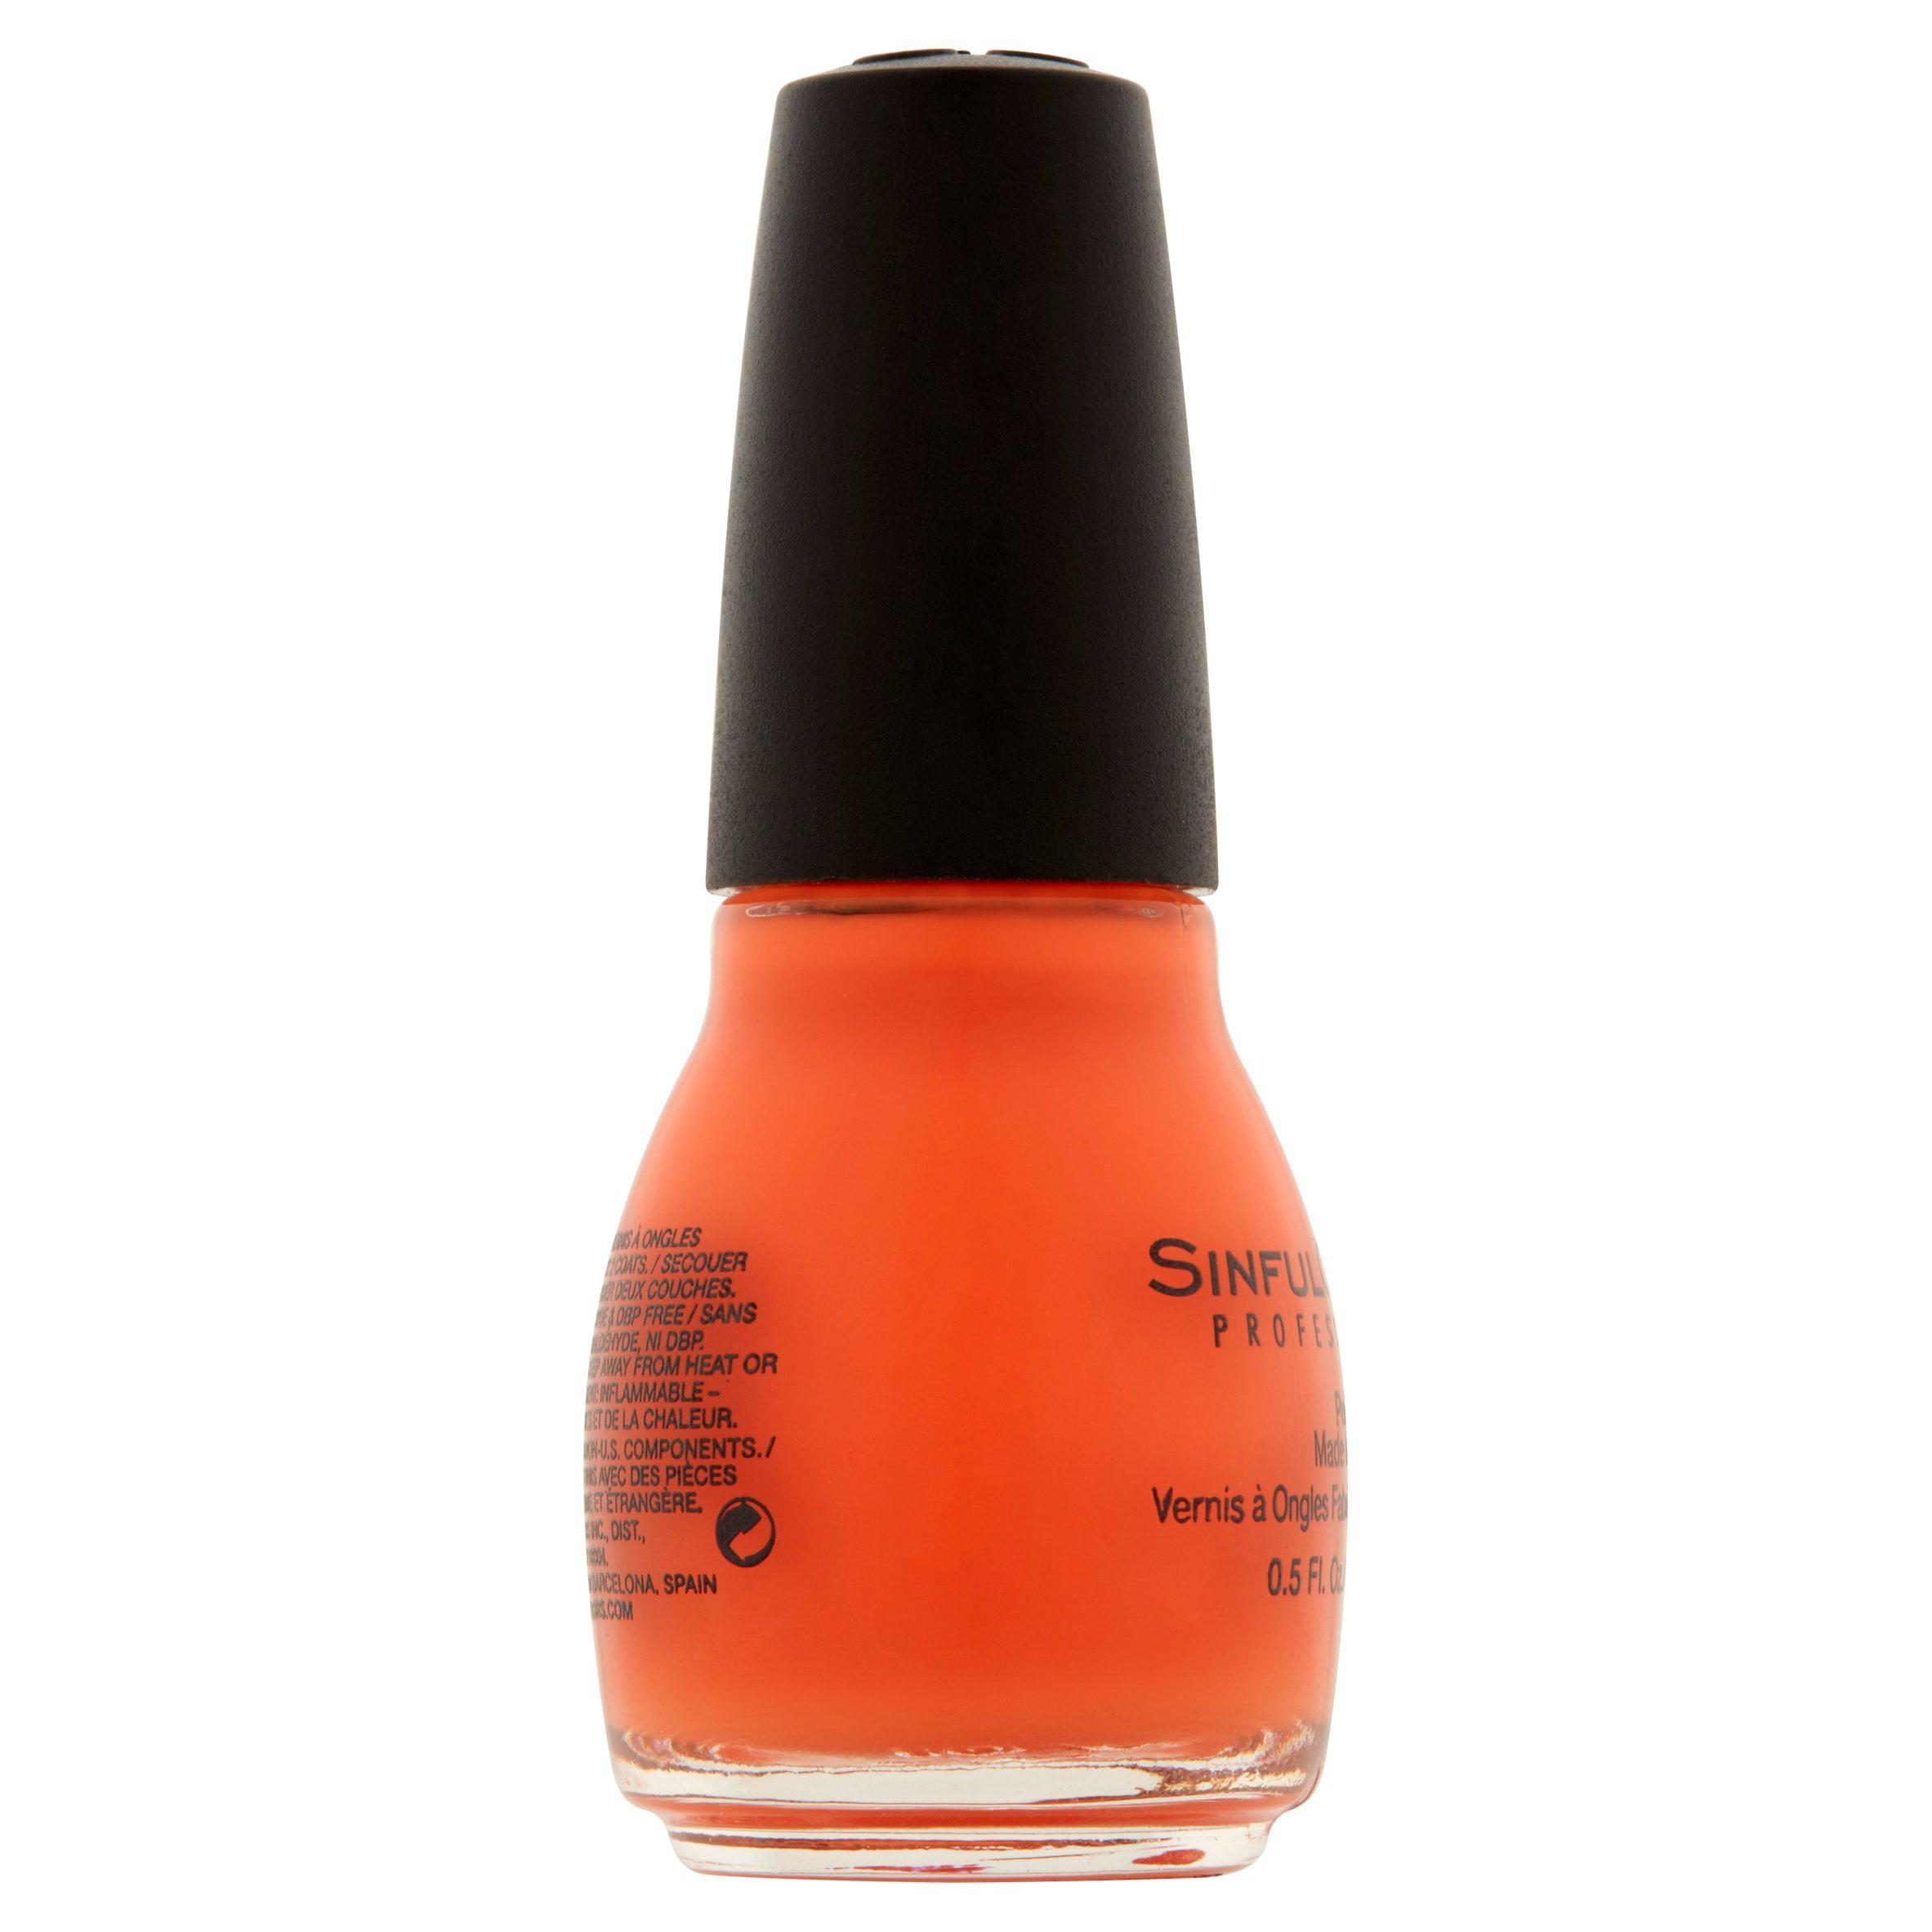 Sinful Colors Professional Nail Polish, Hazard, 0.5 Fl Oz - Walmart.com